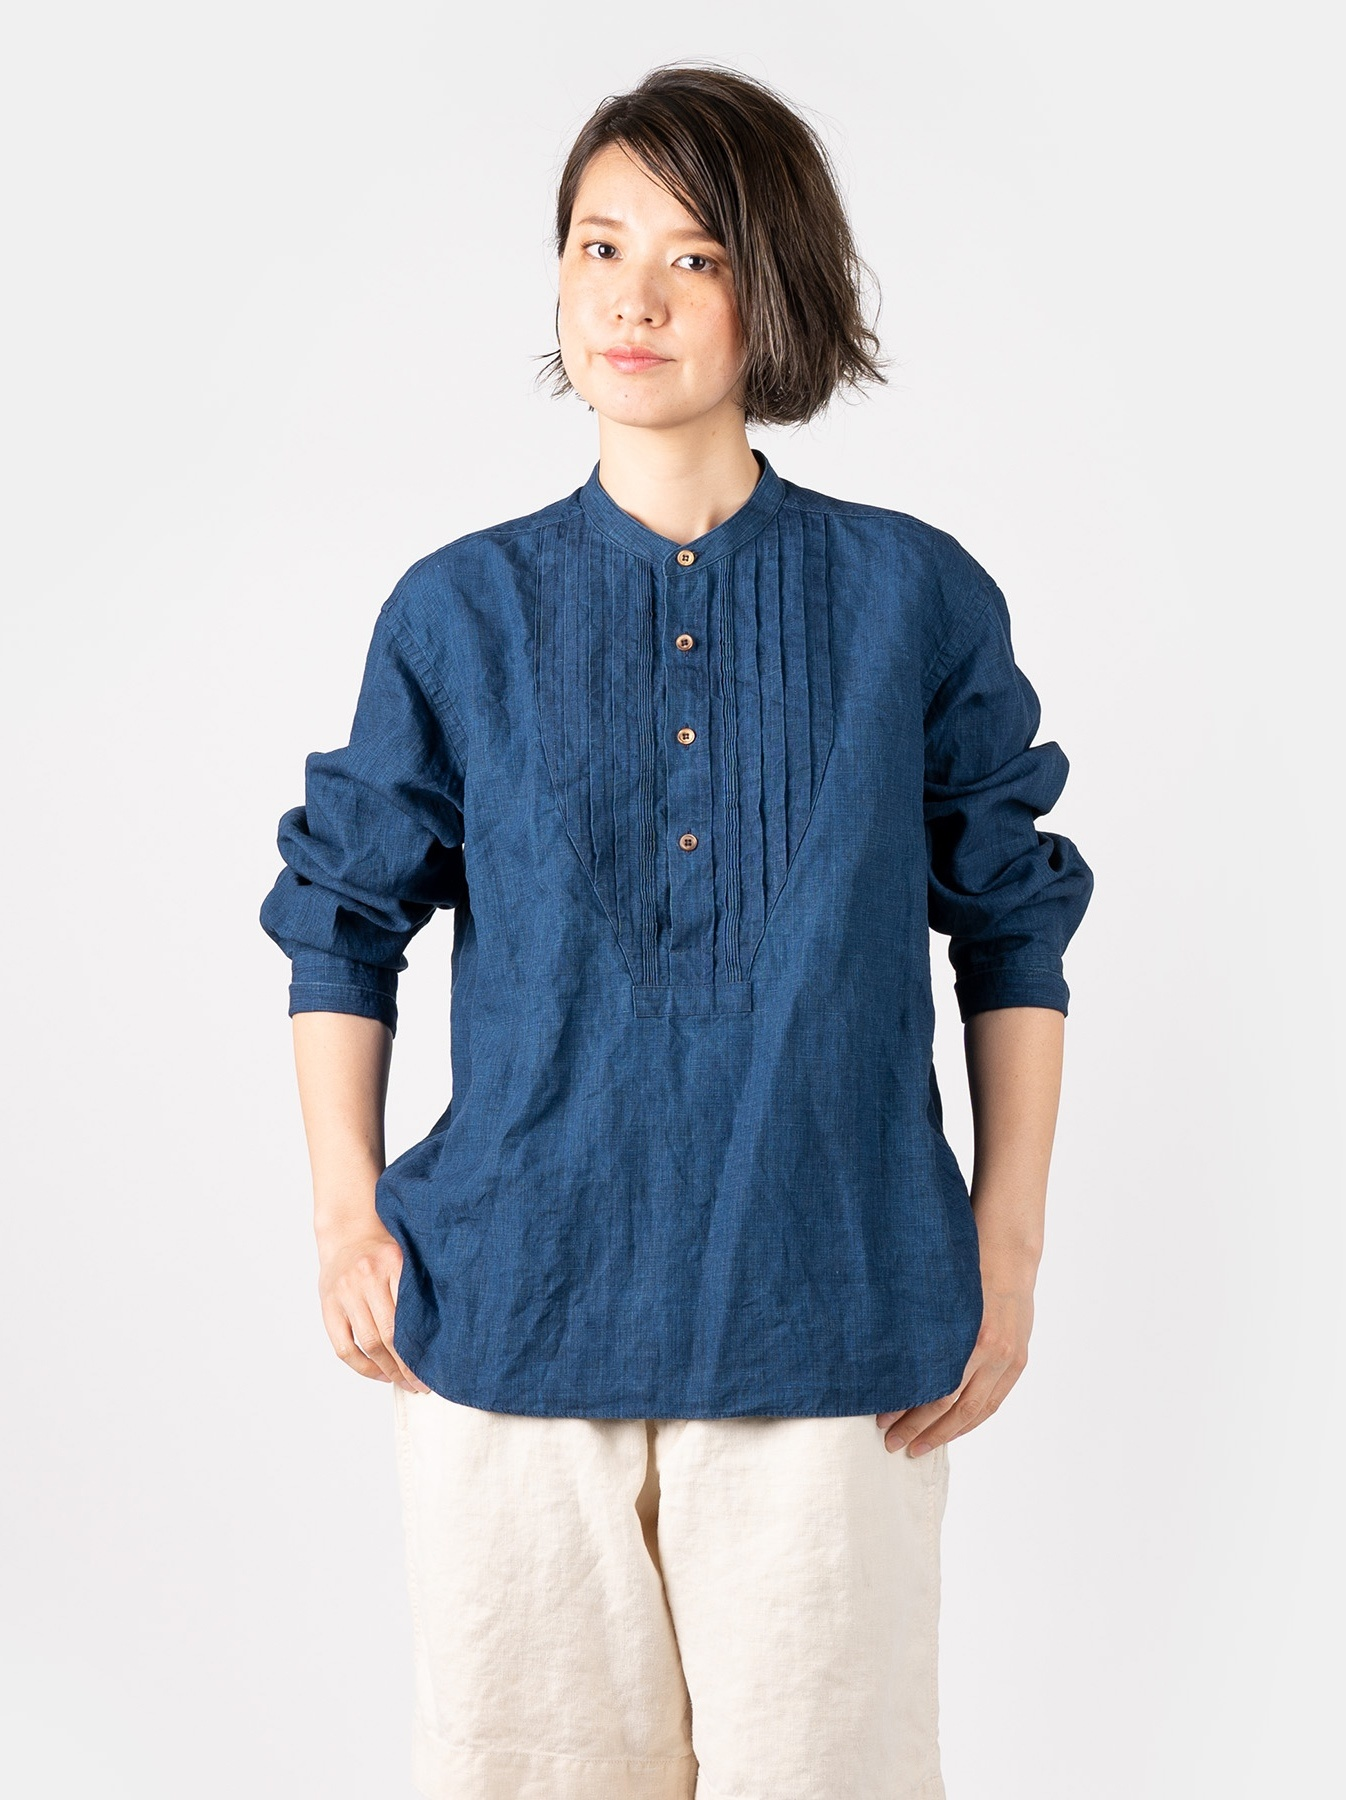 WH Indigo Linen Pin-tuck 908 Shirt-5